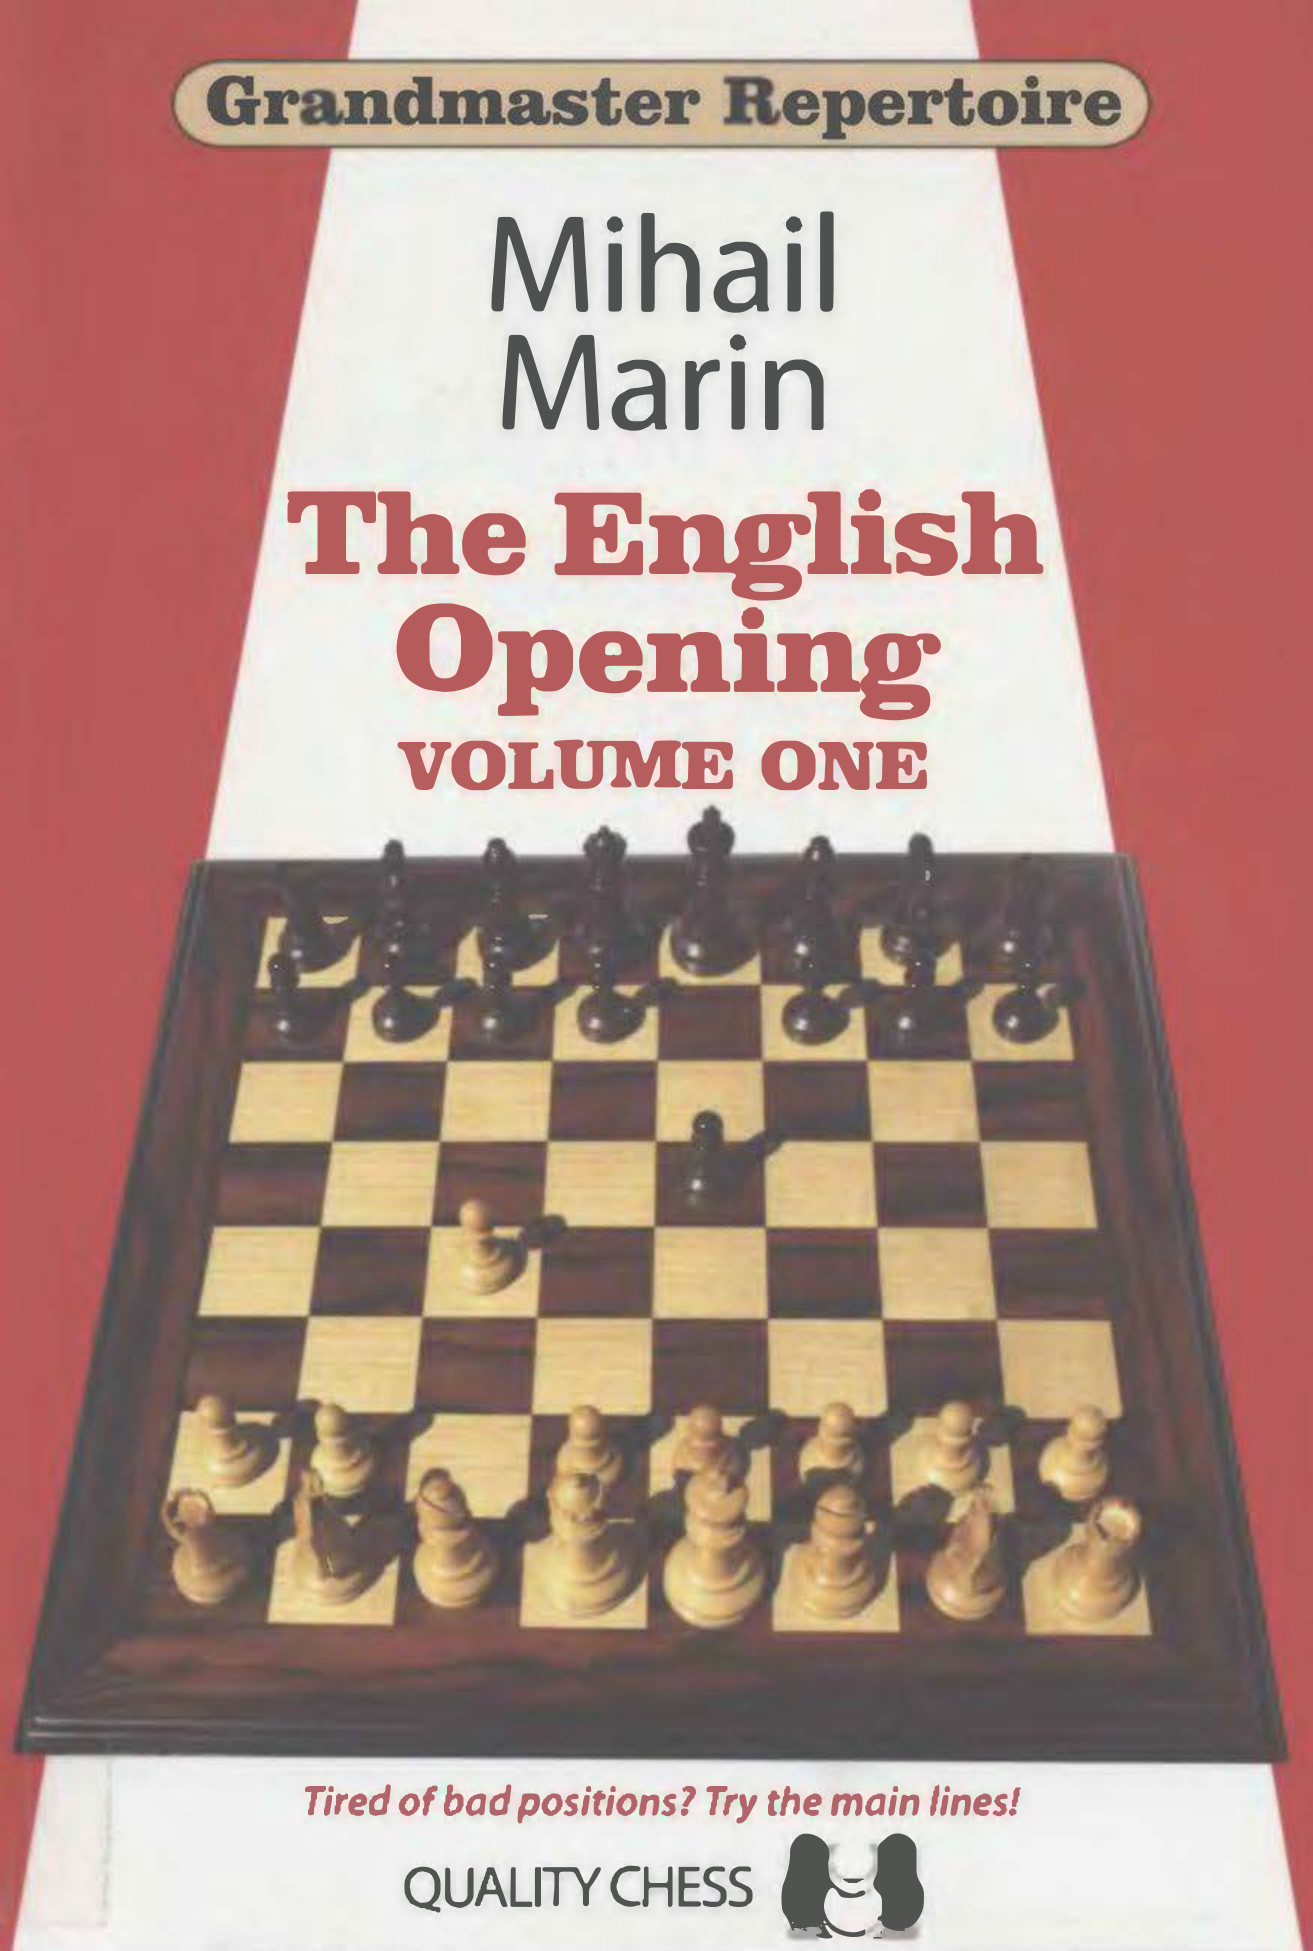 Grandmaster Repertoire 3 The English Opening vol 1